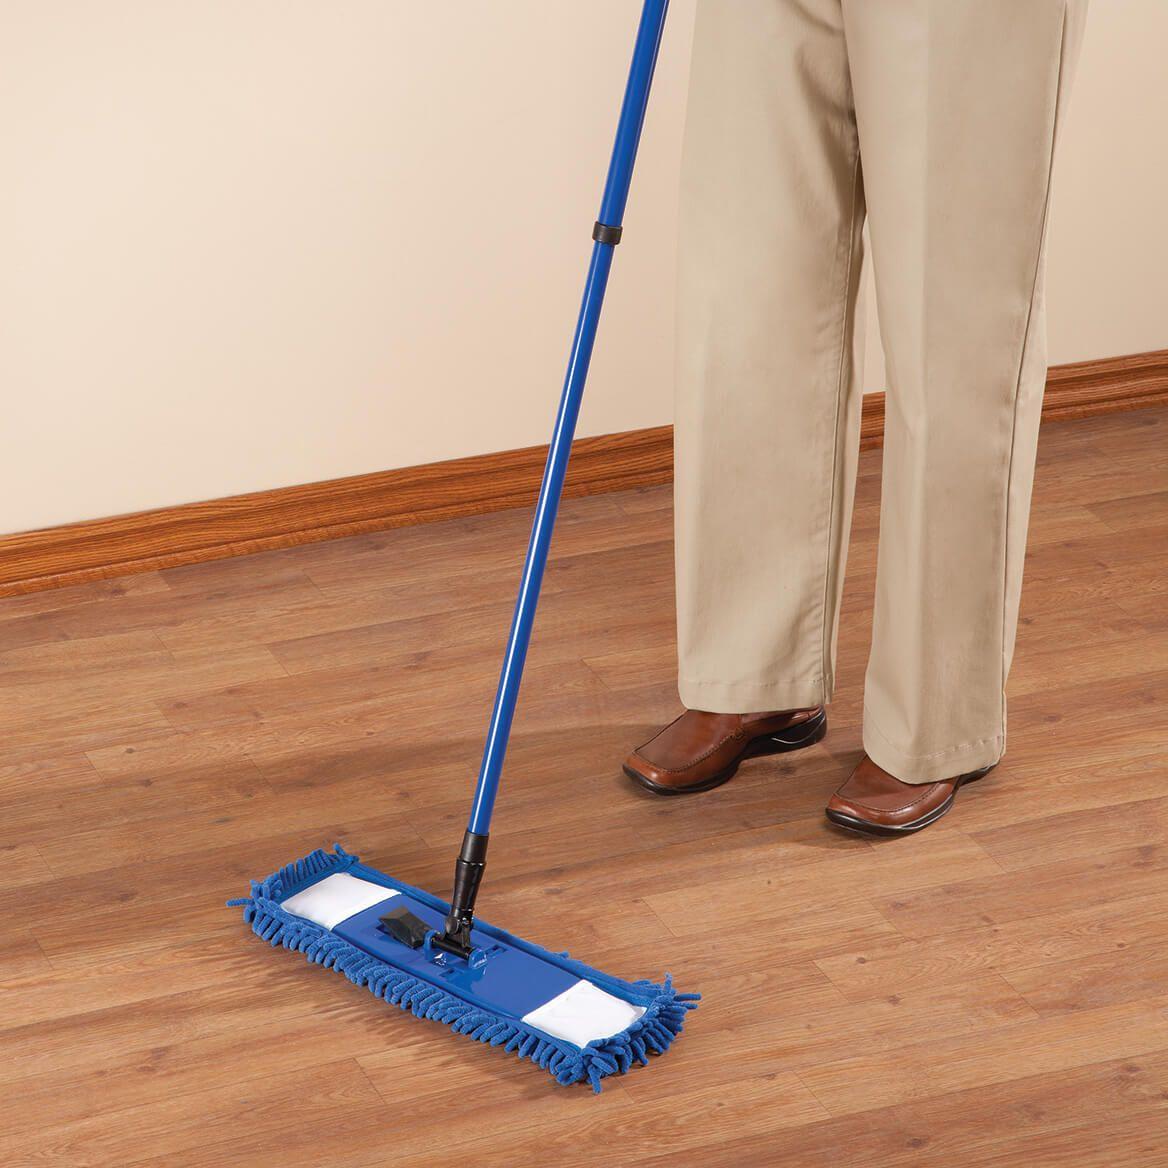 Microfiber Chenille Floor Mop357948 Cleaning mops